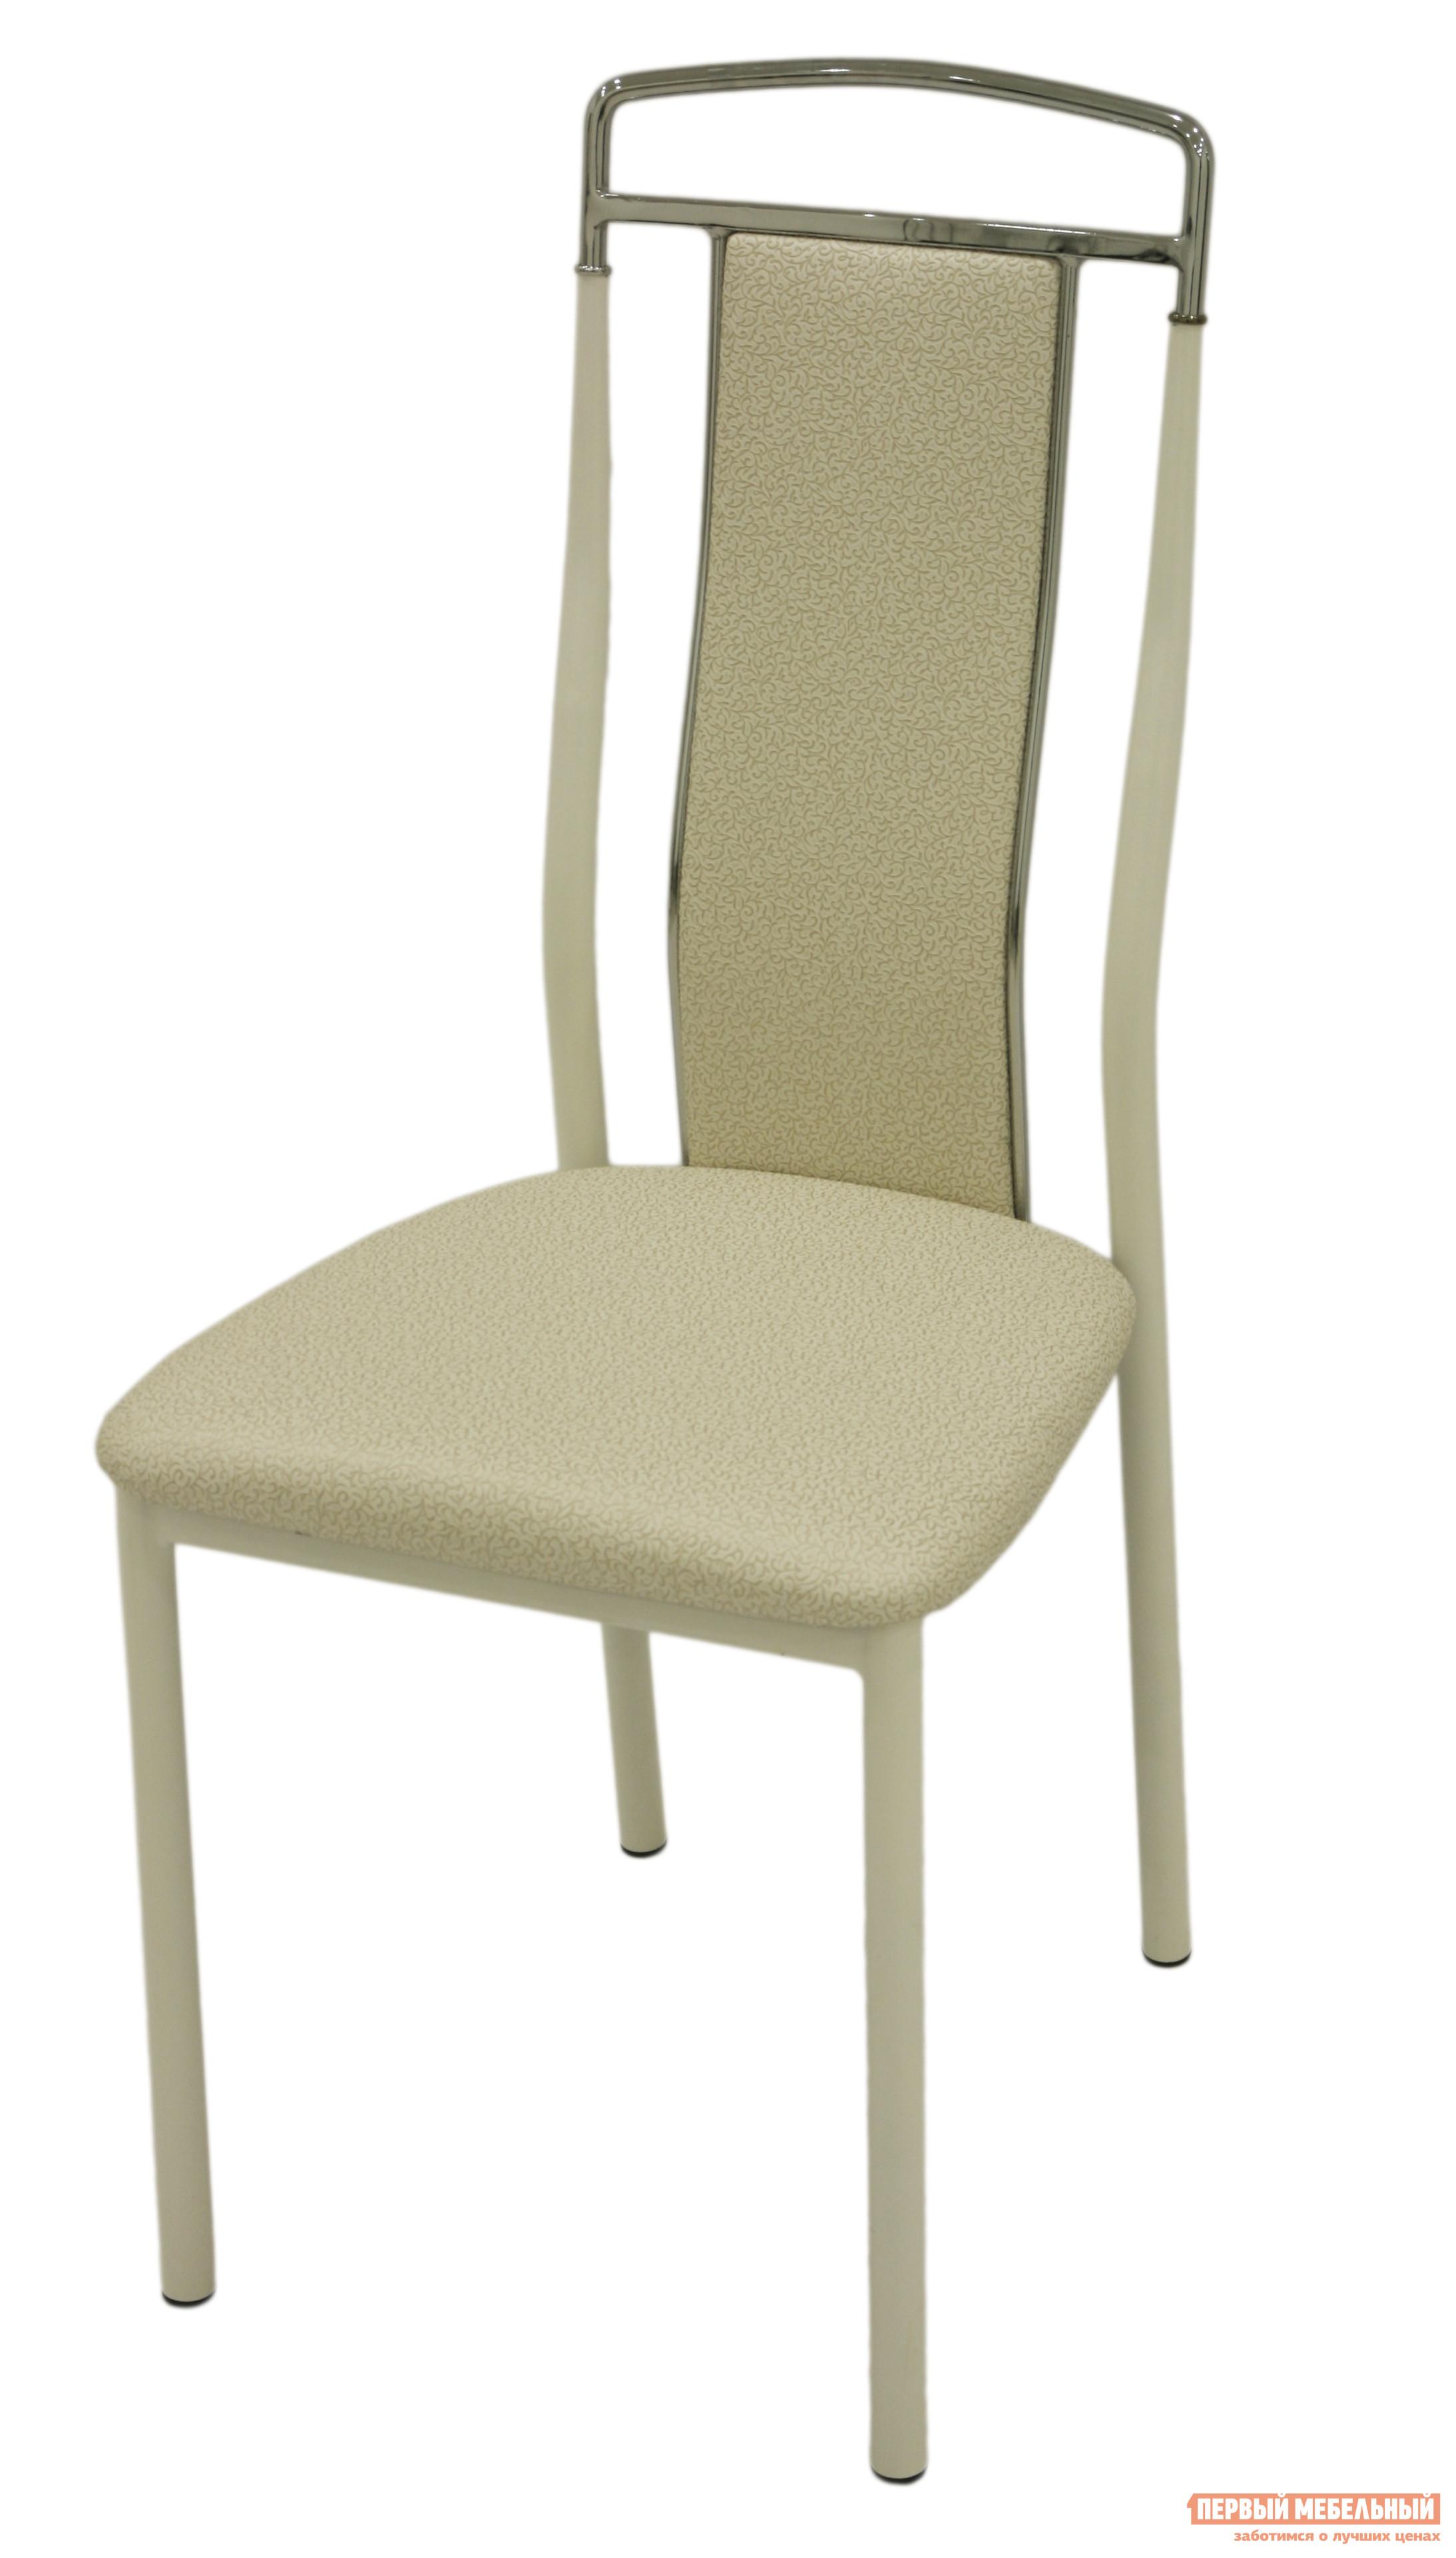 Кухонный стул Бентли Трейд Y368 bently trade стул y368 white 41488